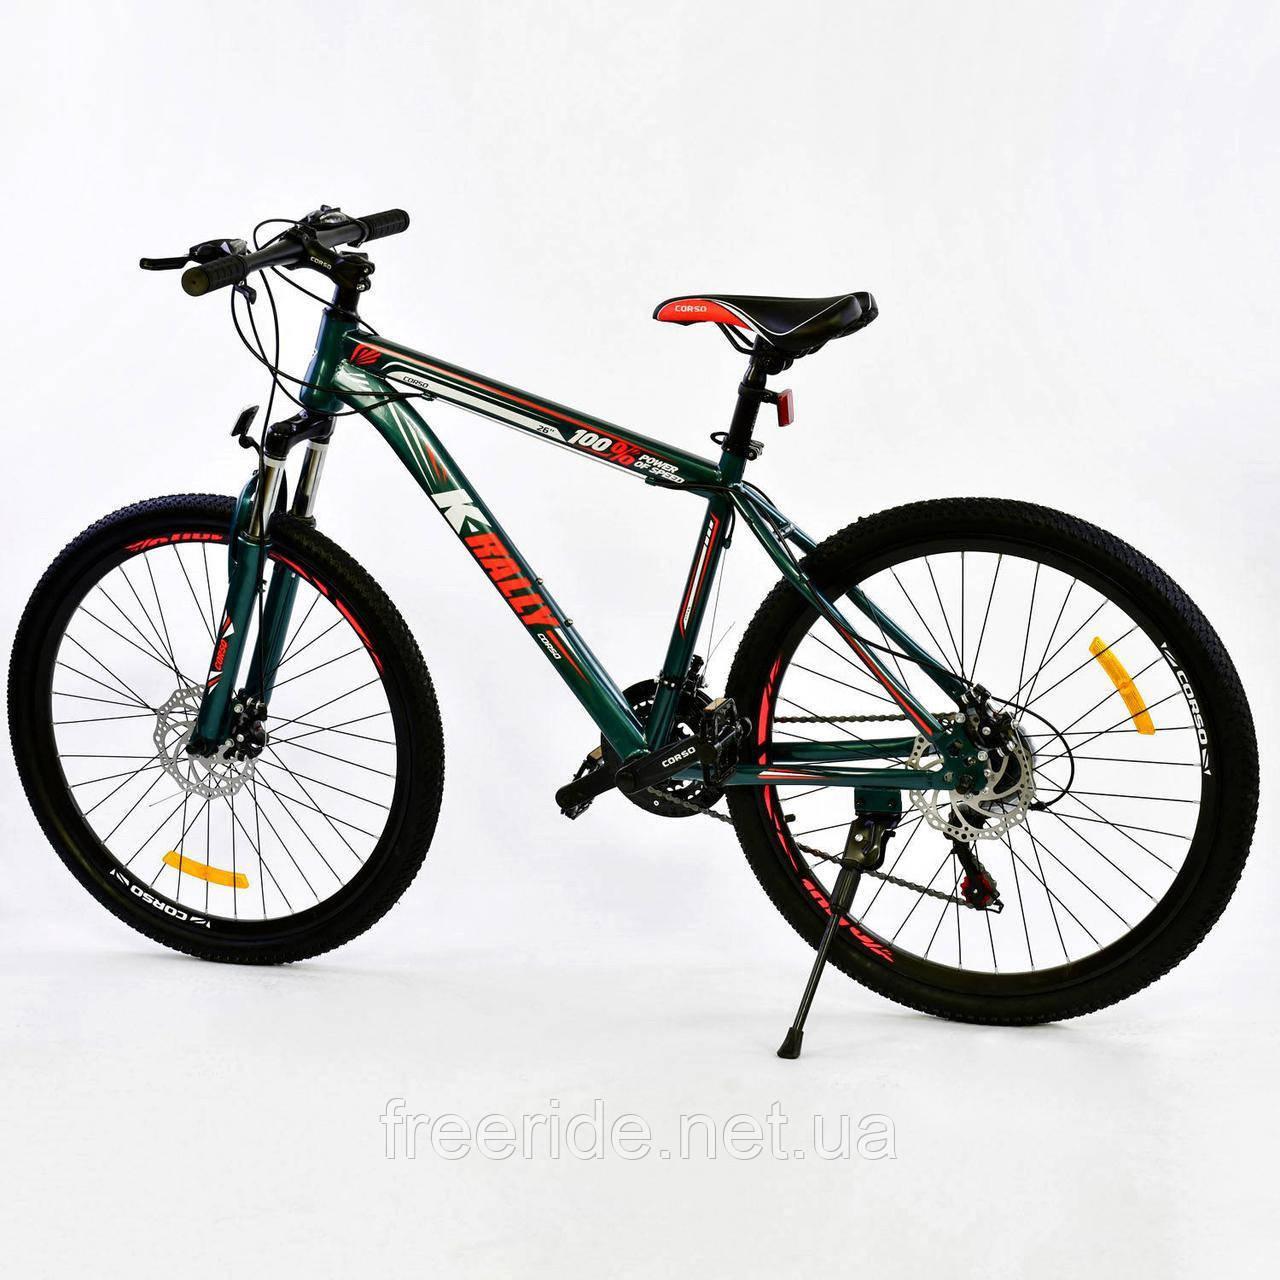 Горный Велосипед CORSO K-Rally 26 (17 рама)